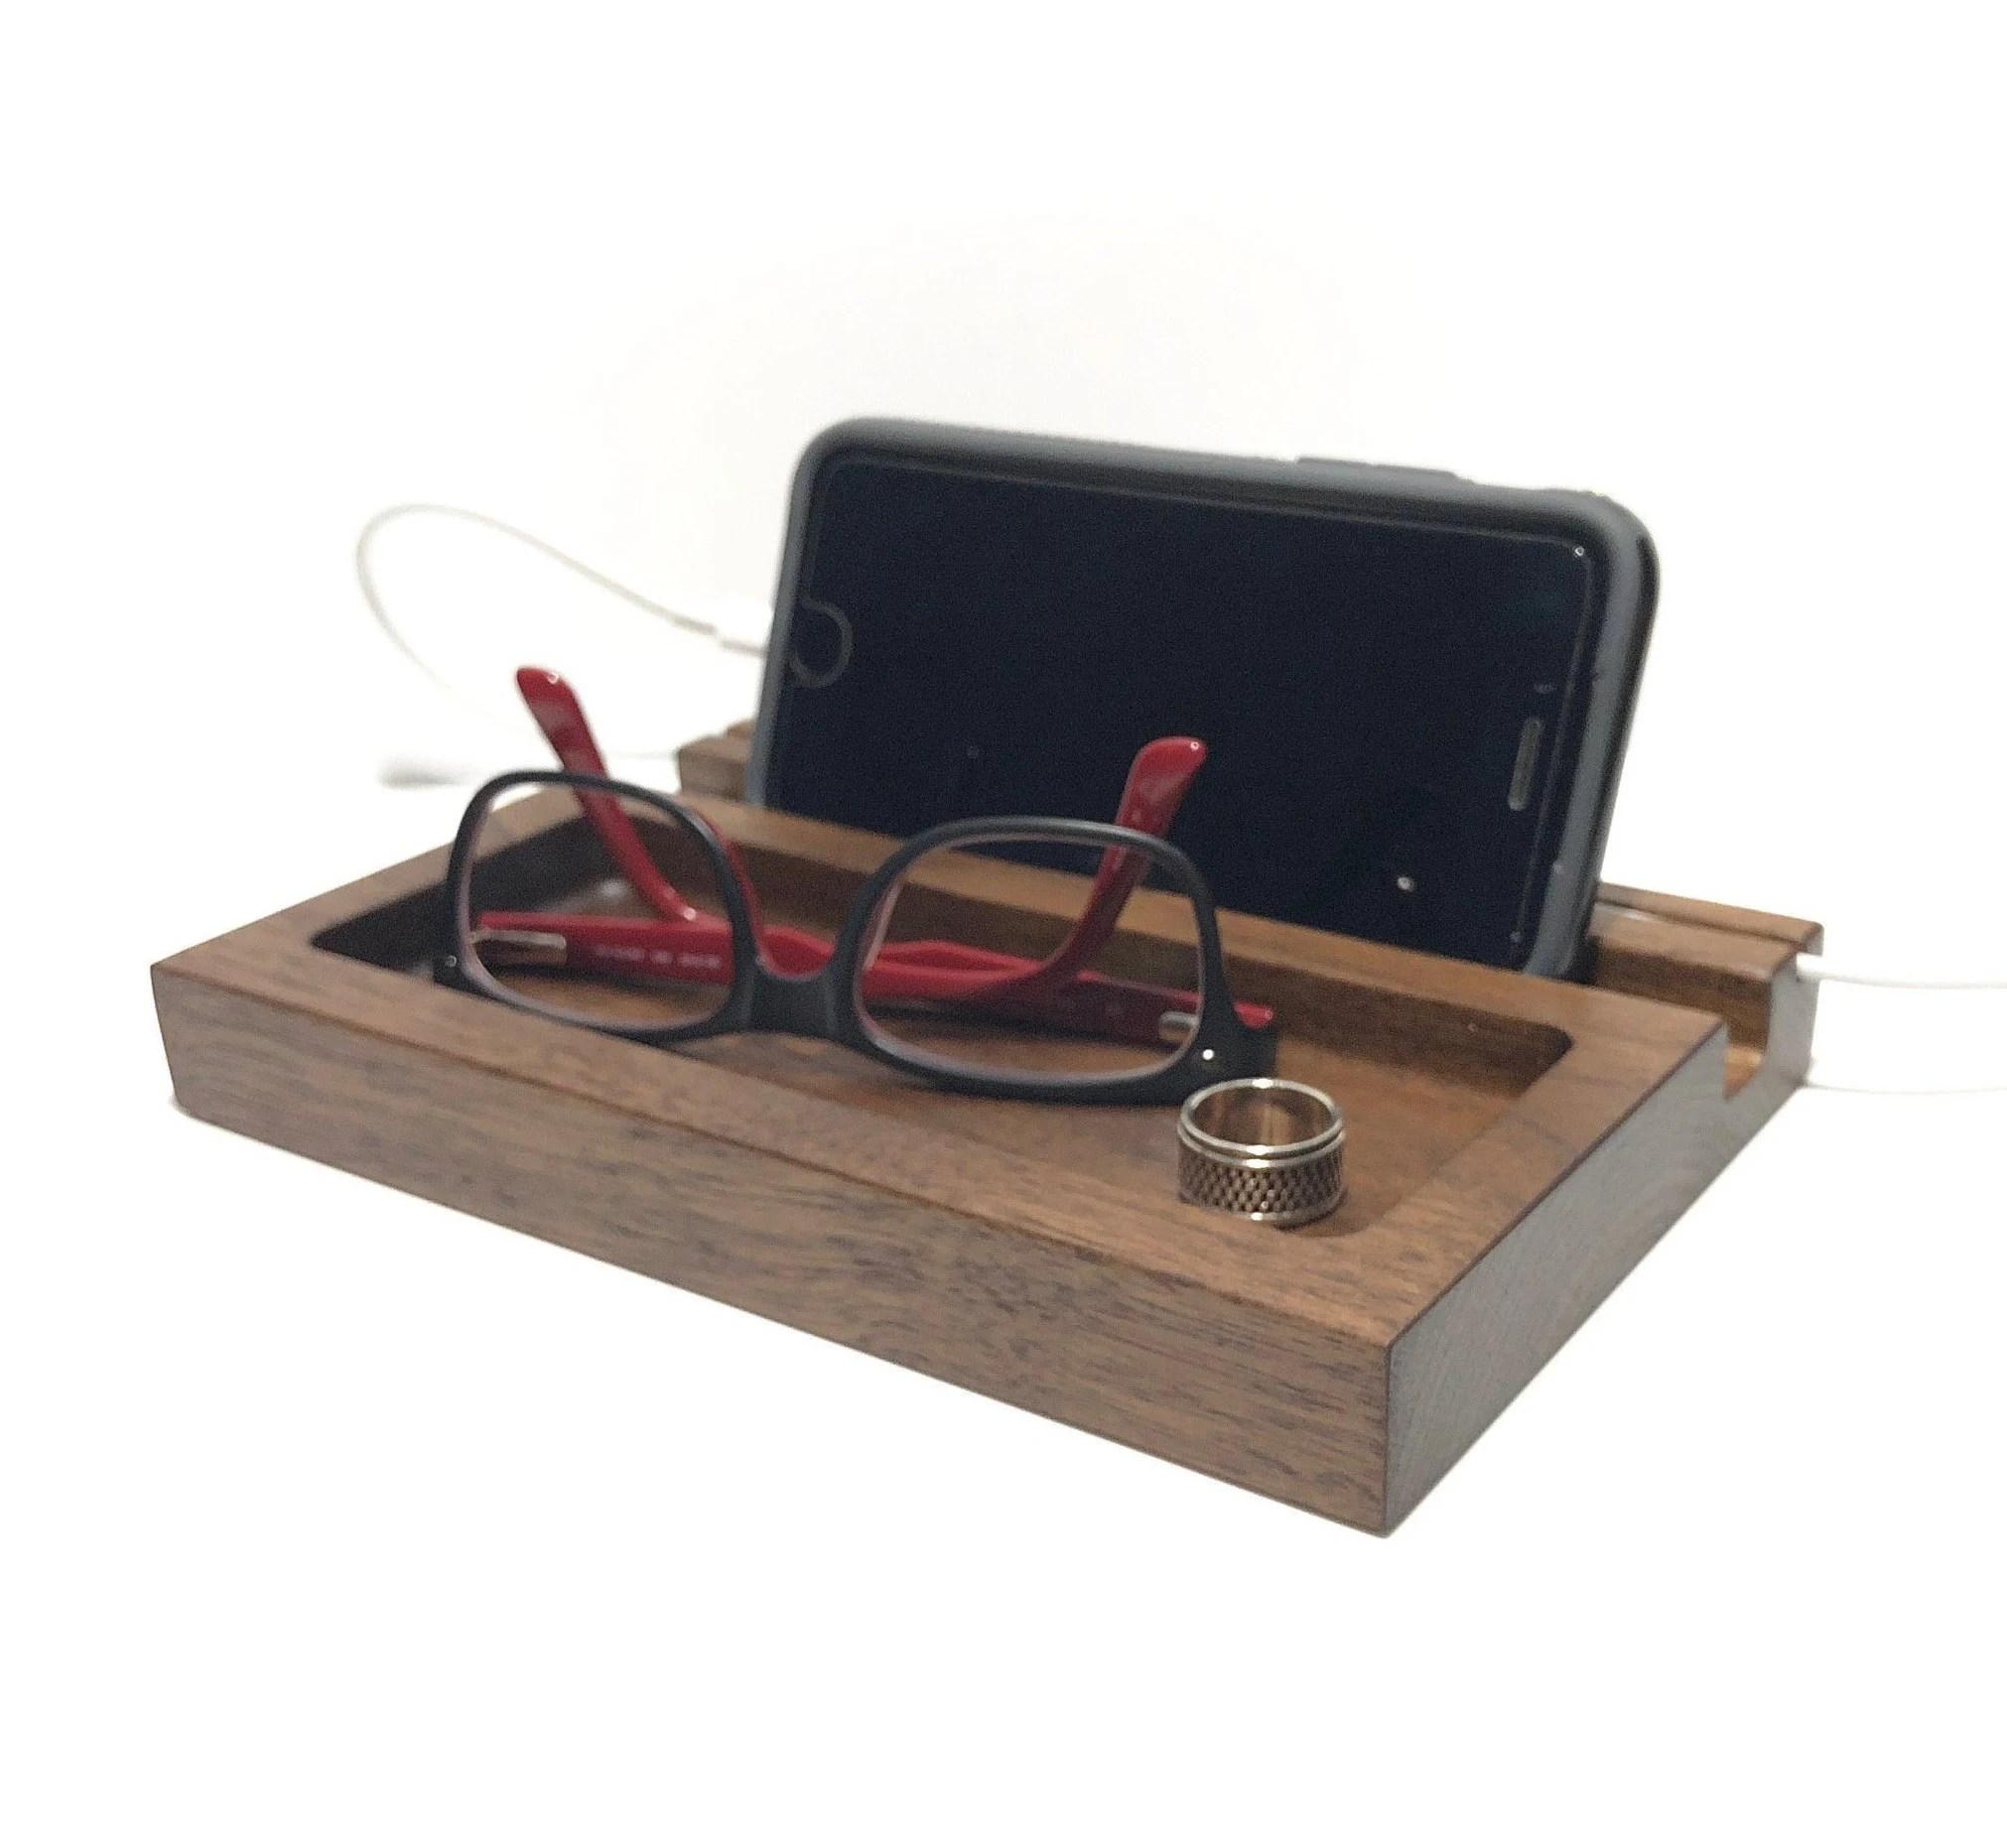 Walnut Phone Docking Station Charging Station Nightstand